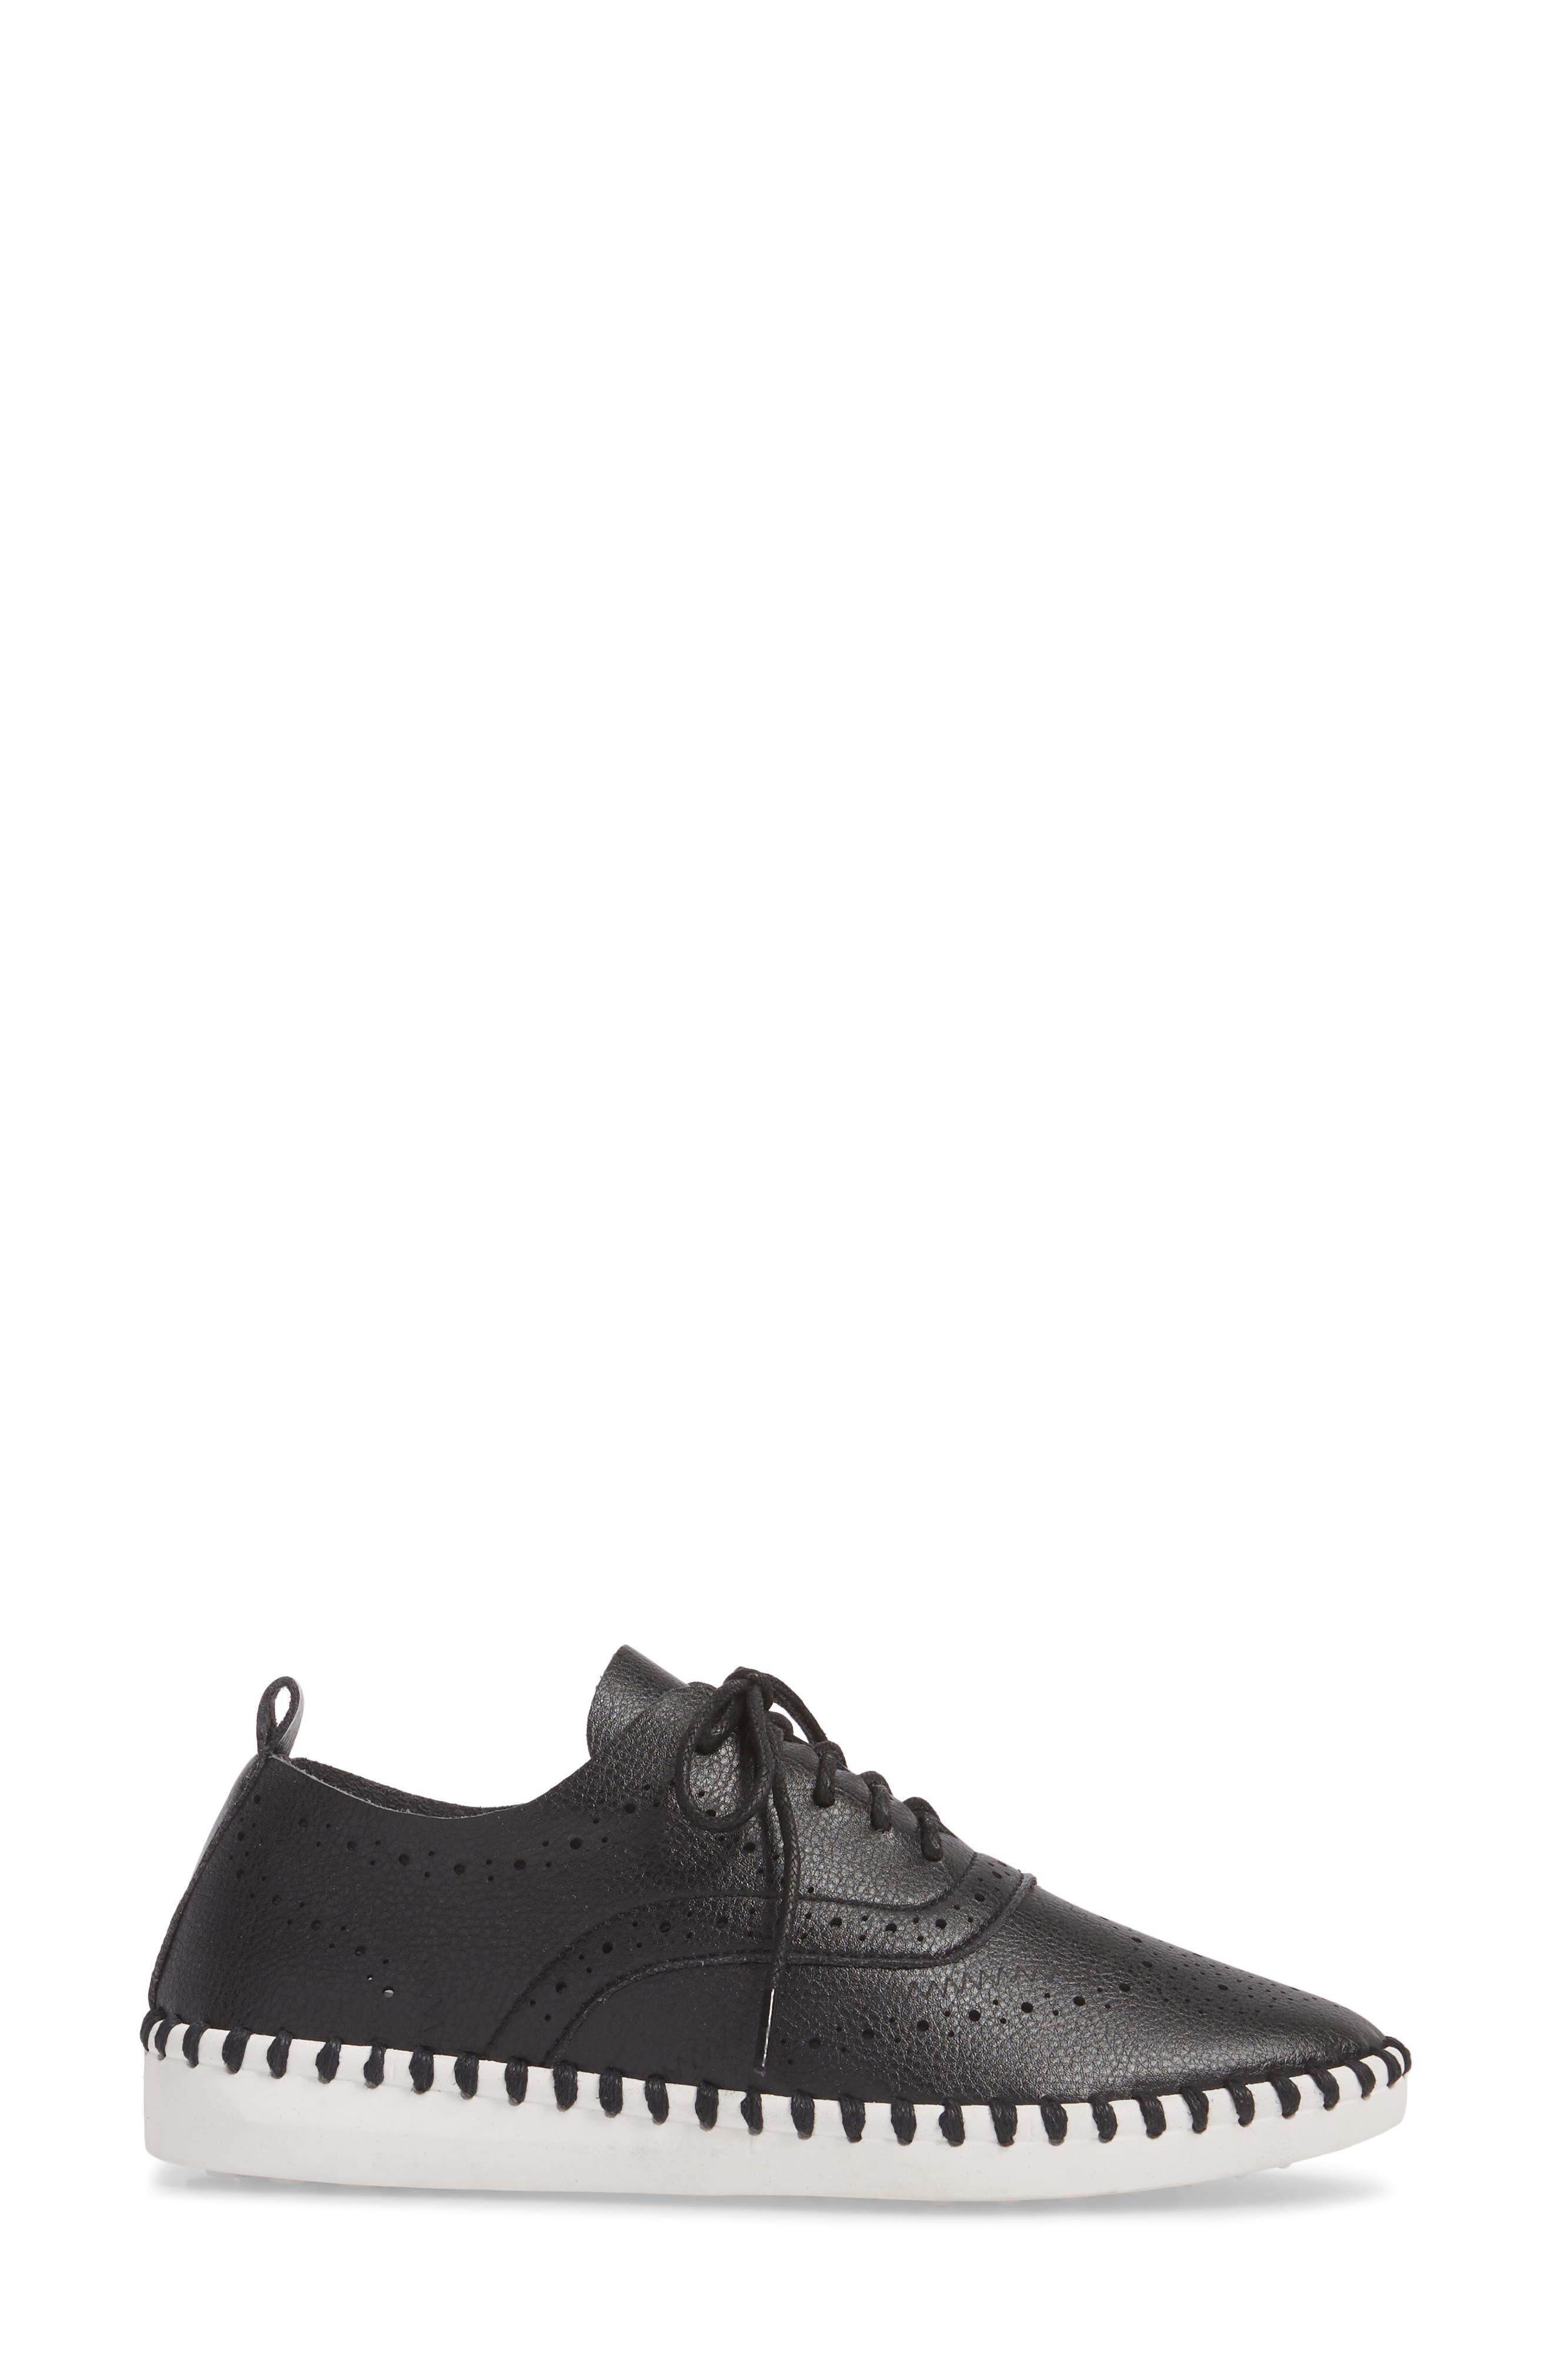 Alternate Image 3  - däv Salinas Waterproof Brogue Lace-Up Sneaker (Women)